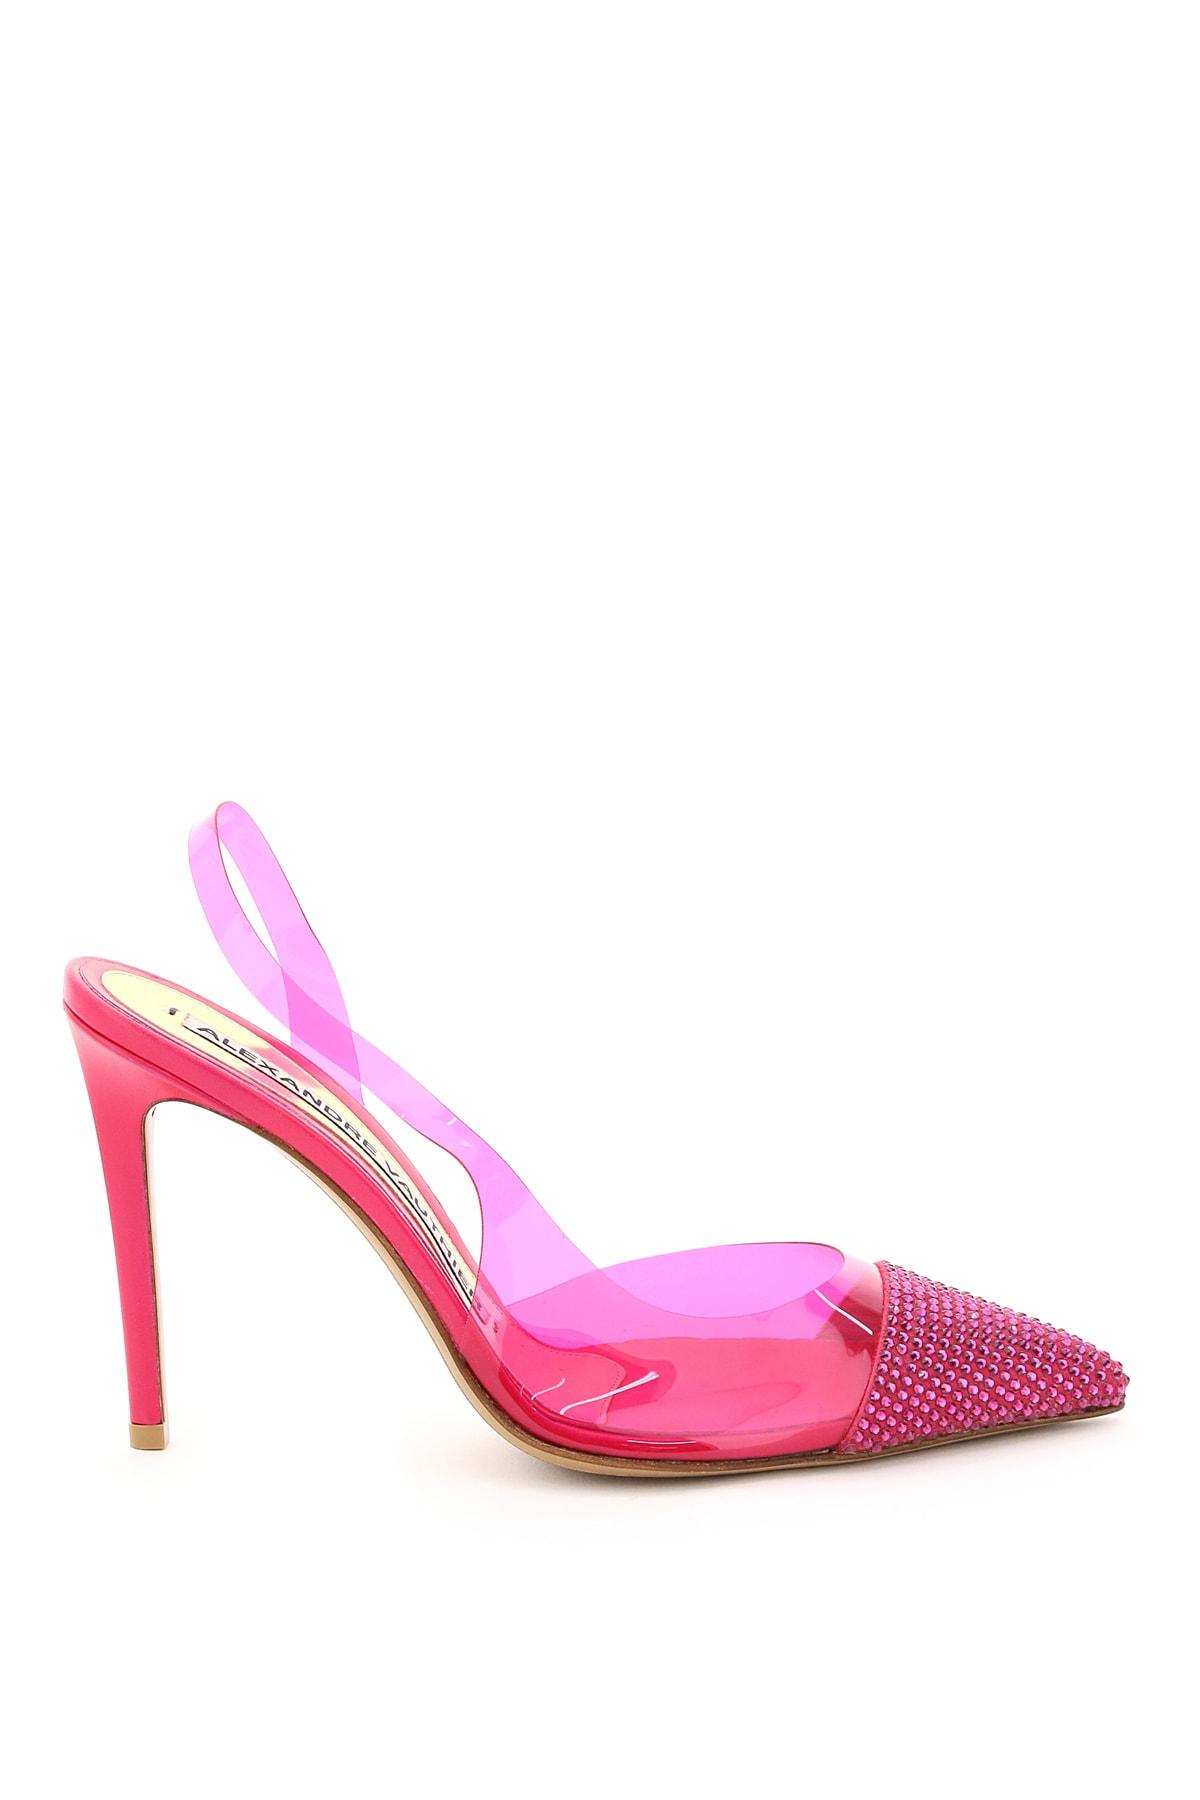 Alexandre Vauthier Shoes SLINGBACK PUMPS PVC STRASS AMBER 100